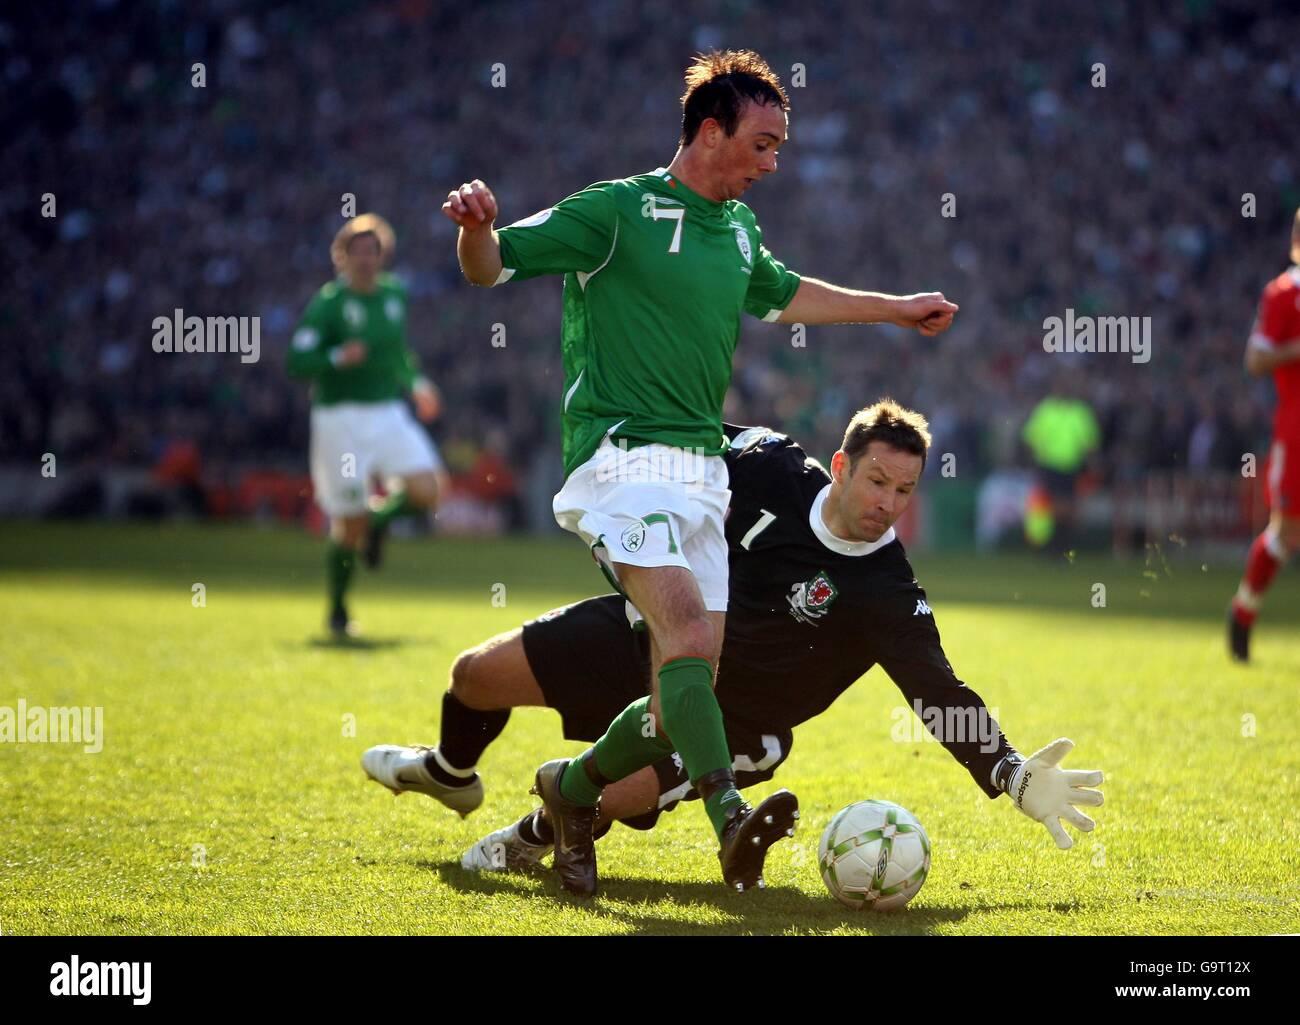 Soccer - UEFA European Championship 2008 Qualifying - Group D - Republic of Ireland v Wales - Croke Park - Stock Image